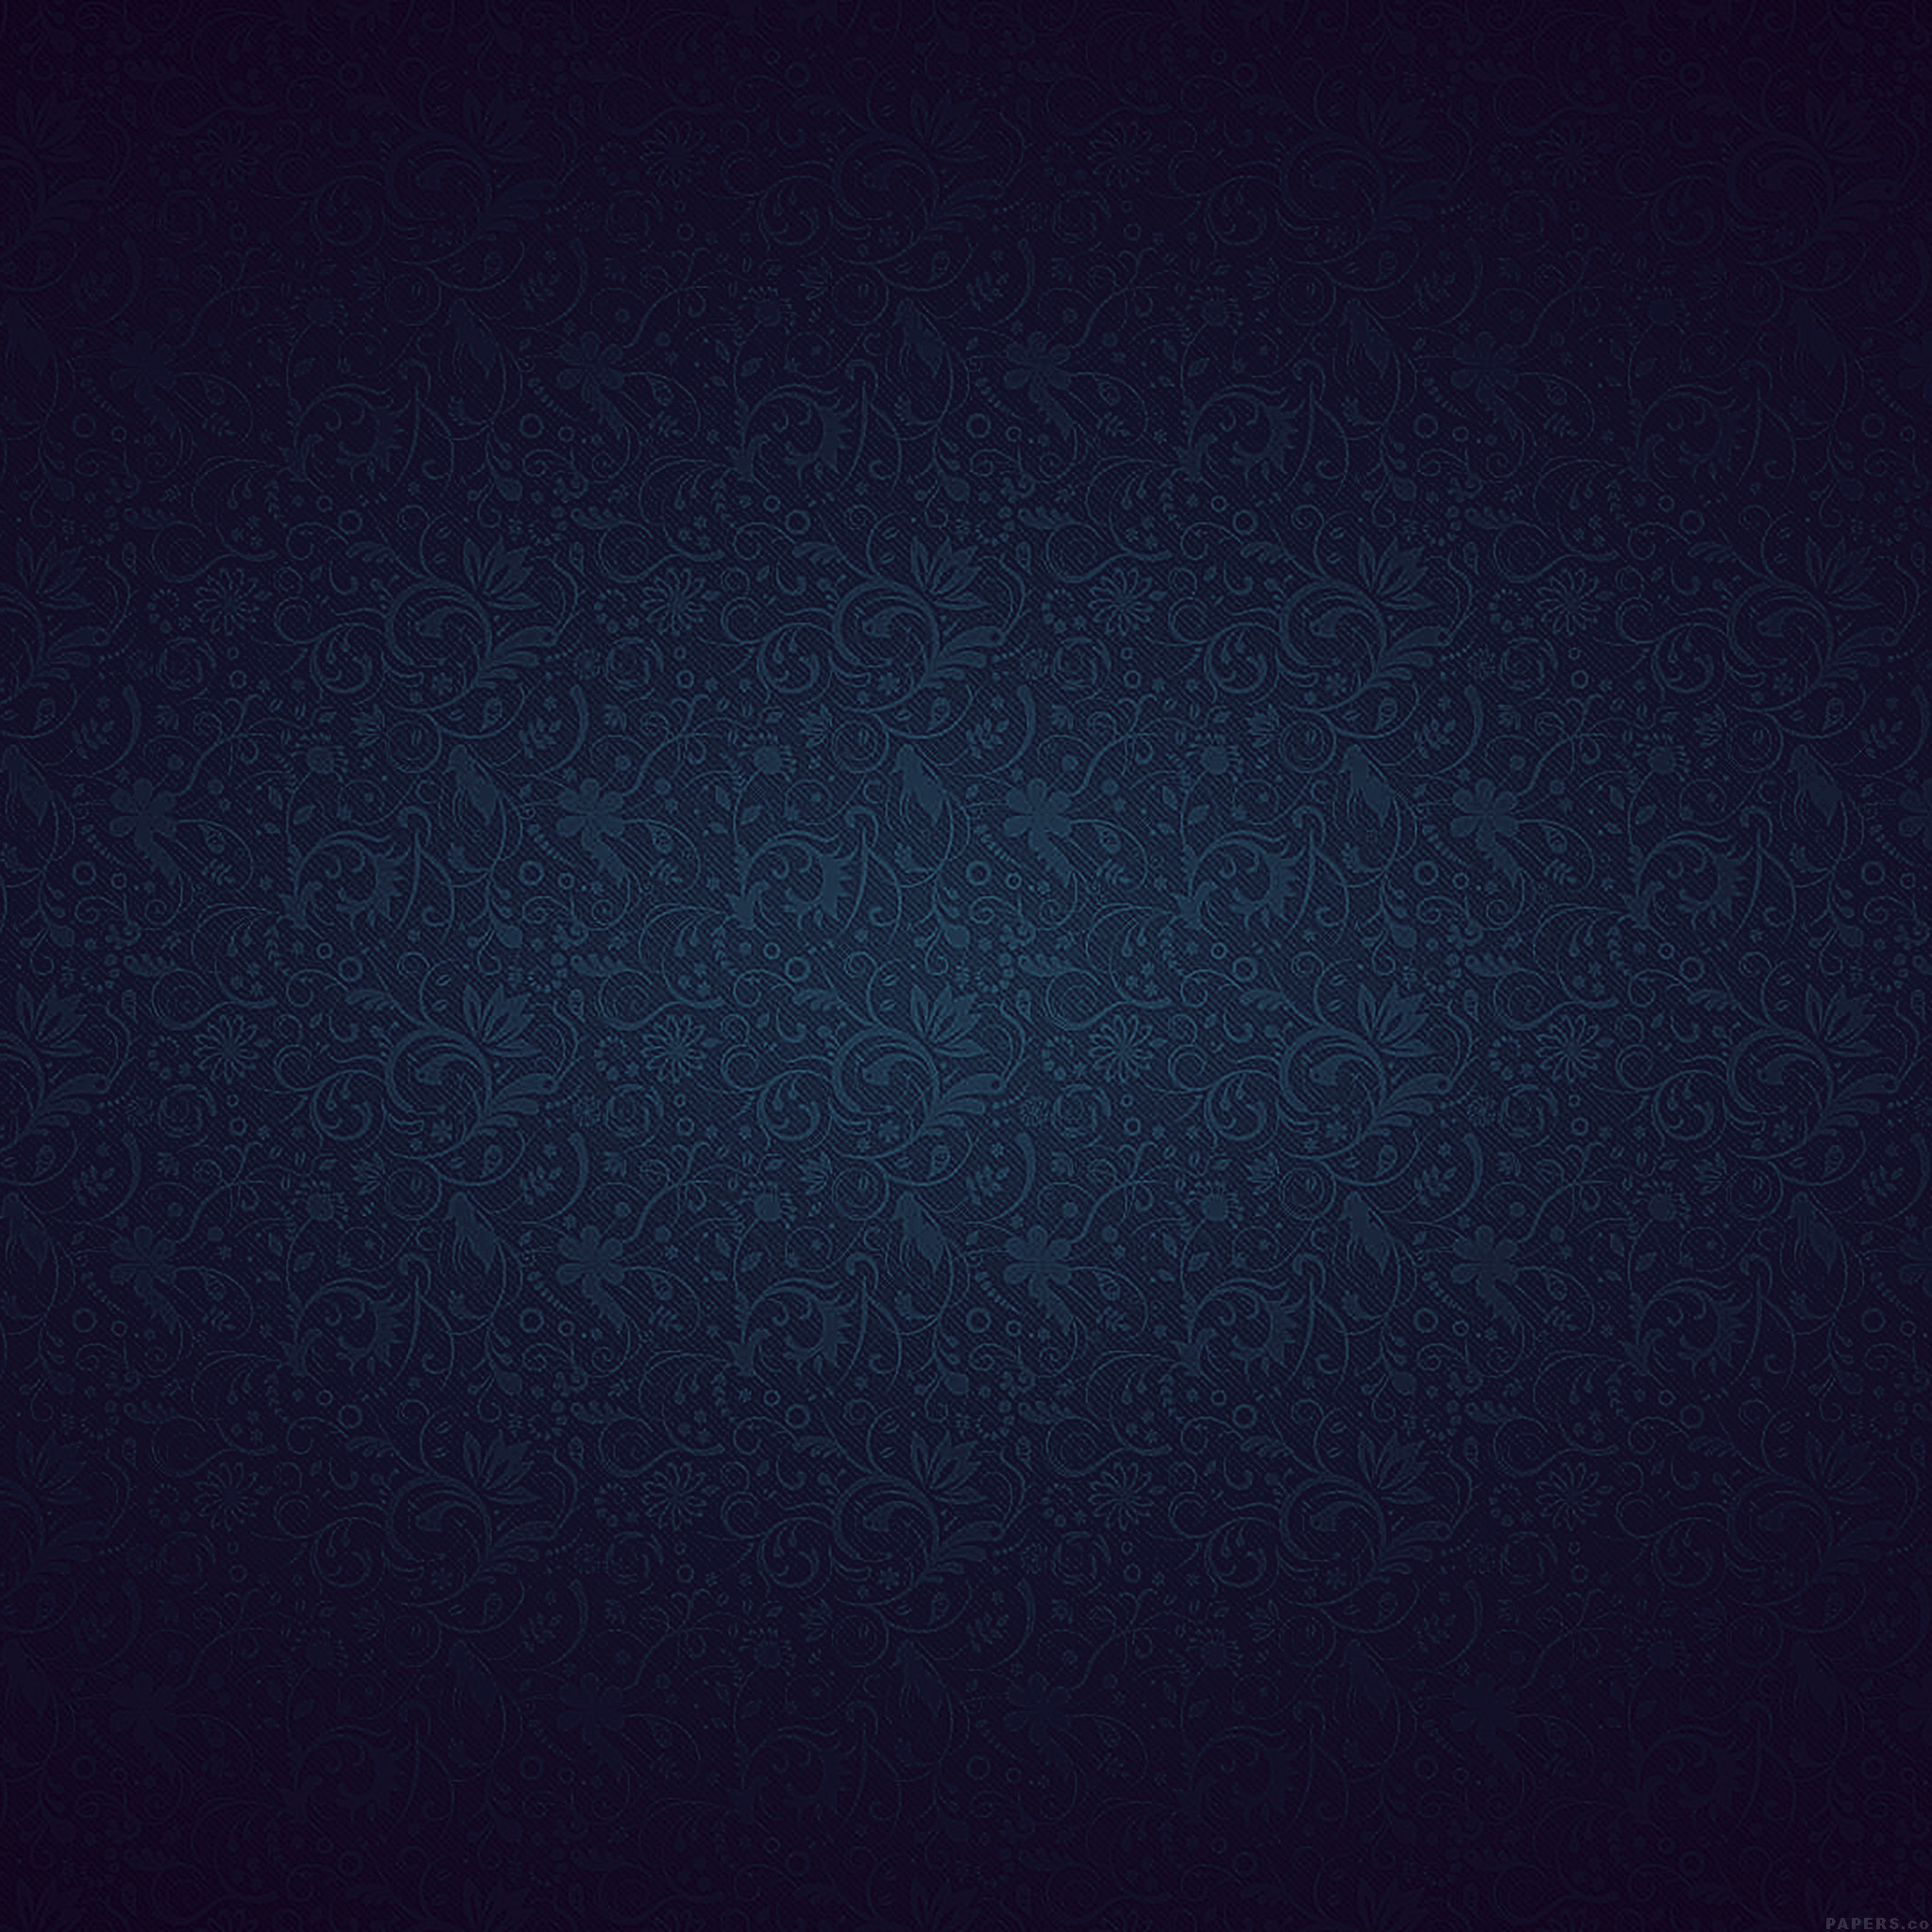 Dark Blue And Gold Bedroom Ideas: Vf81-dark-blue-ornament-texture-pattern